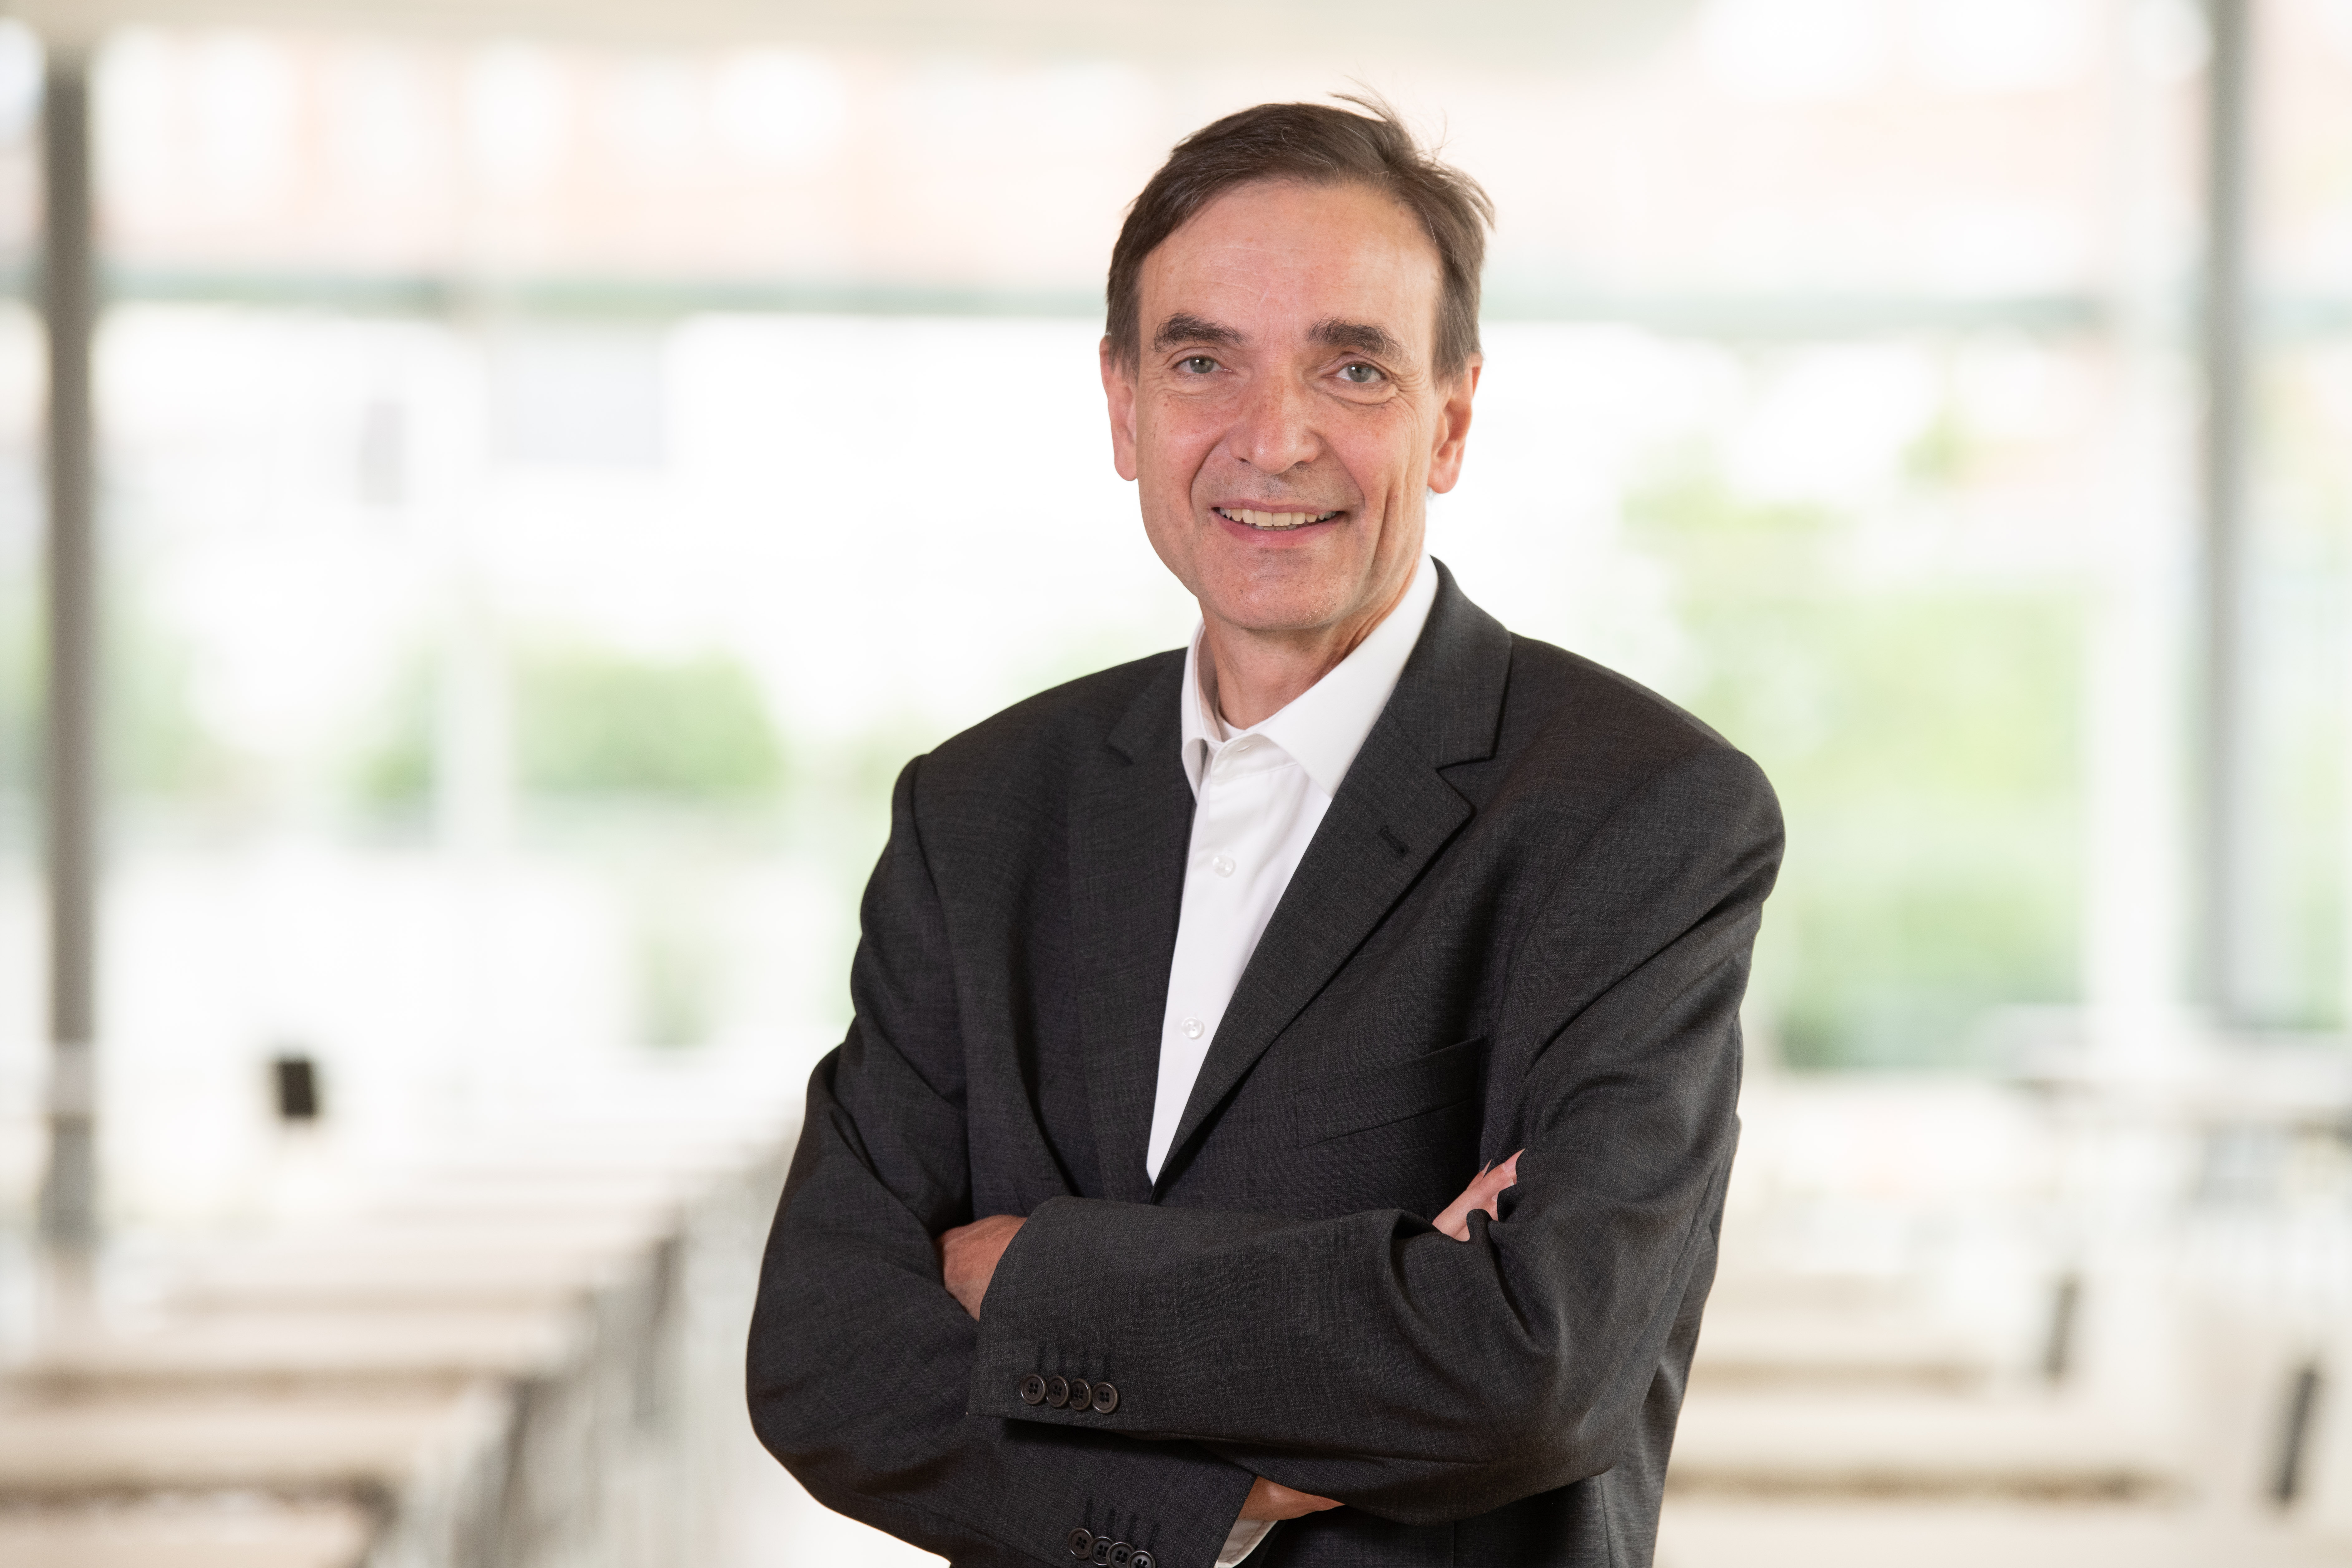 Dr. Falko Papenfuss